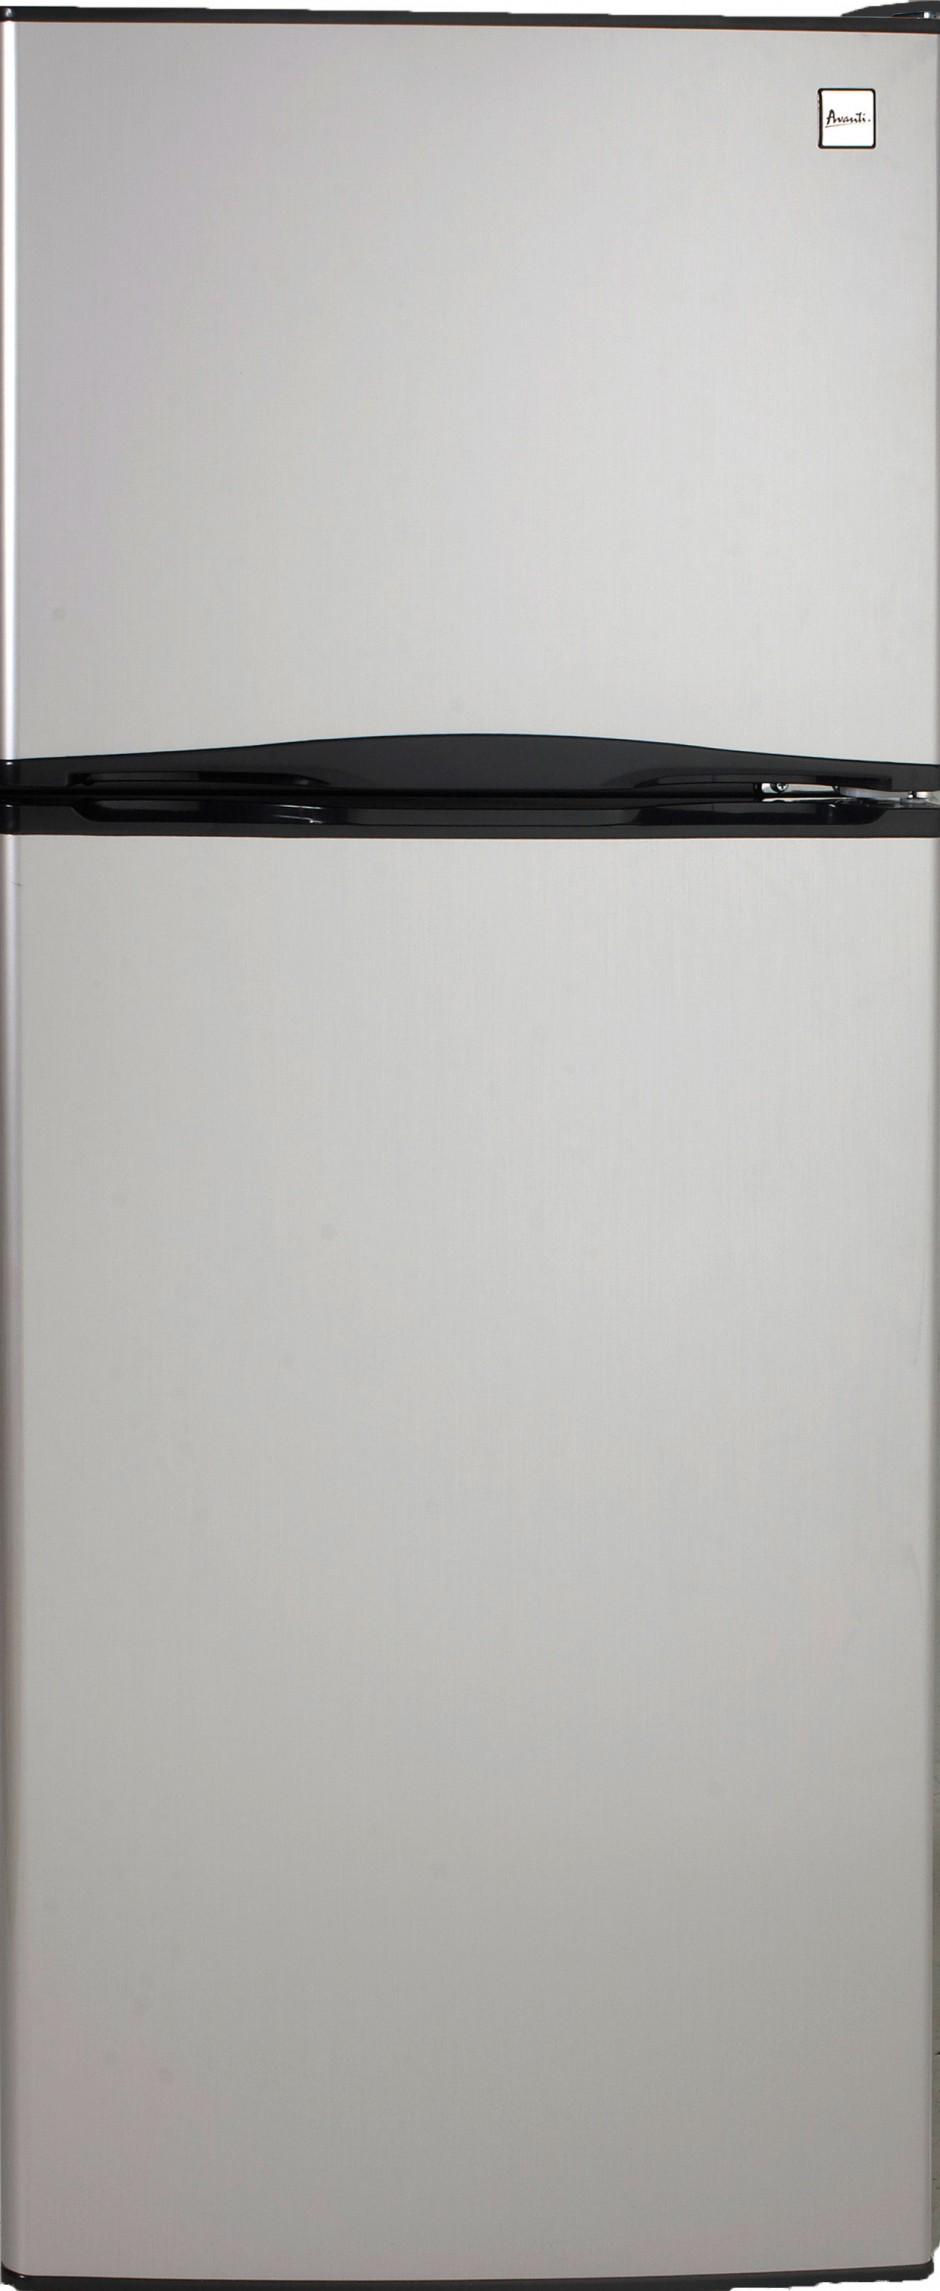 Countertop Freezer Canada | Avanti Refrigerator | Compact Side By Side Refrigerator